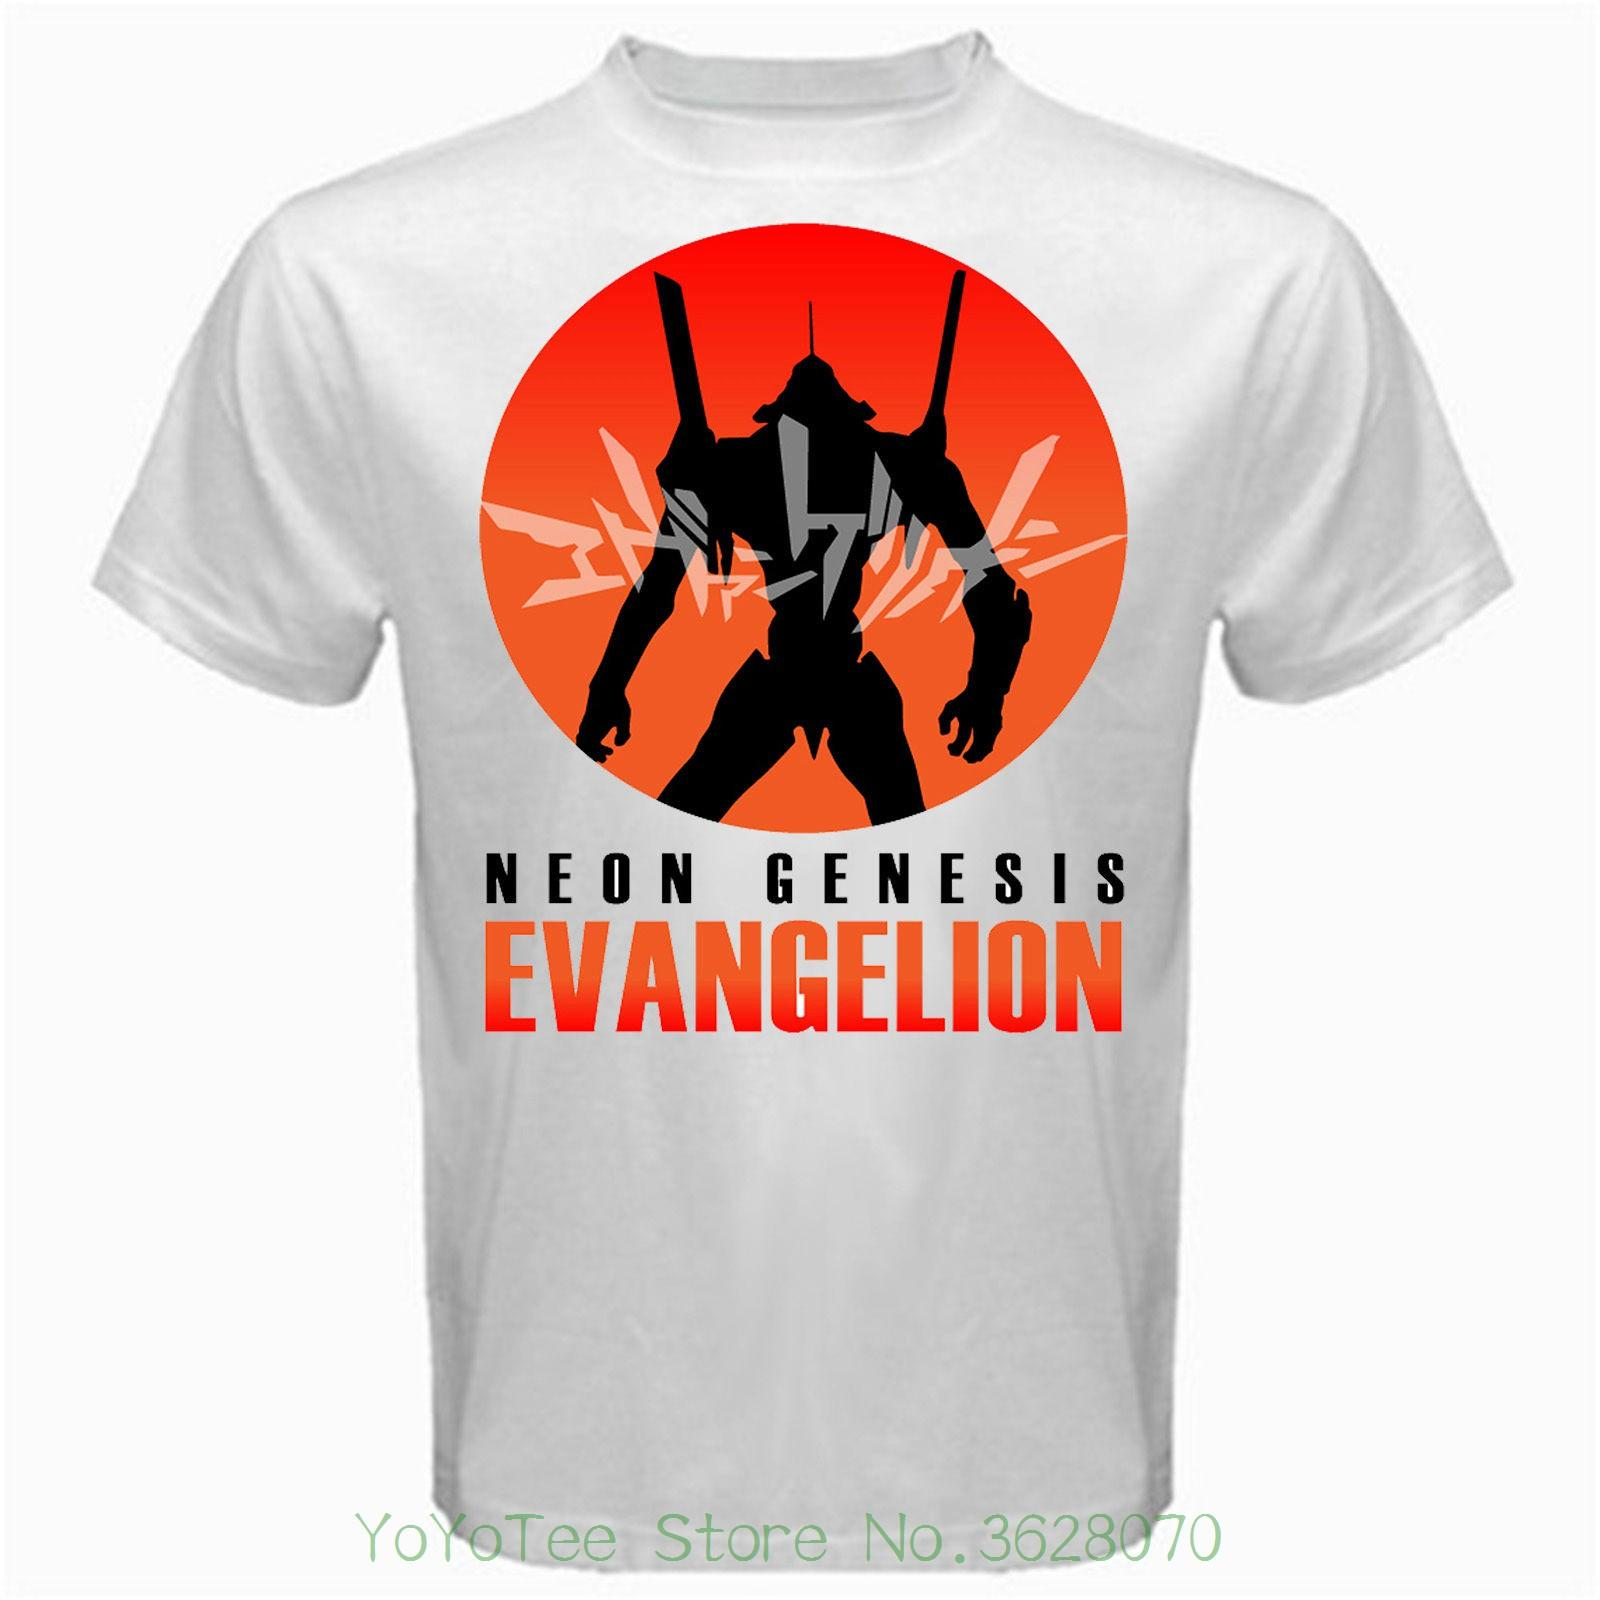 T Shirt Design Basic Top Neon Genesis Evangelion Japan Anime Tv